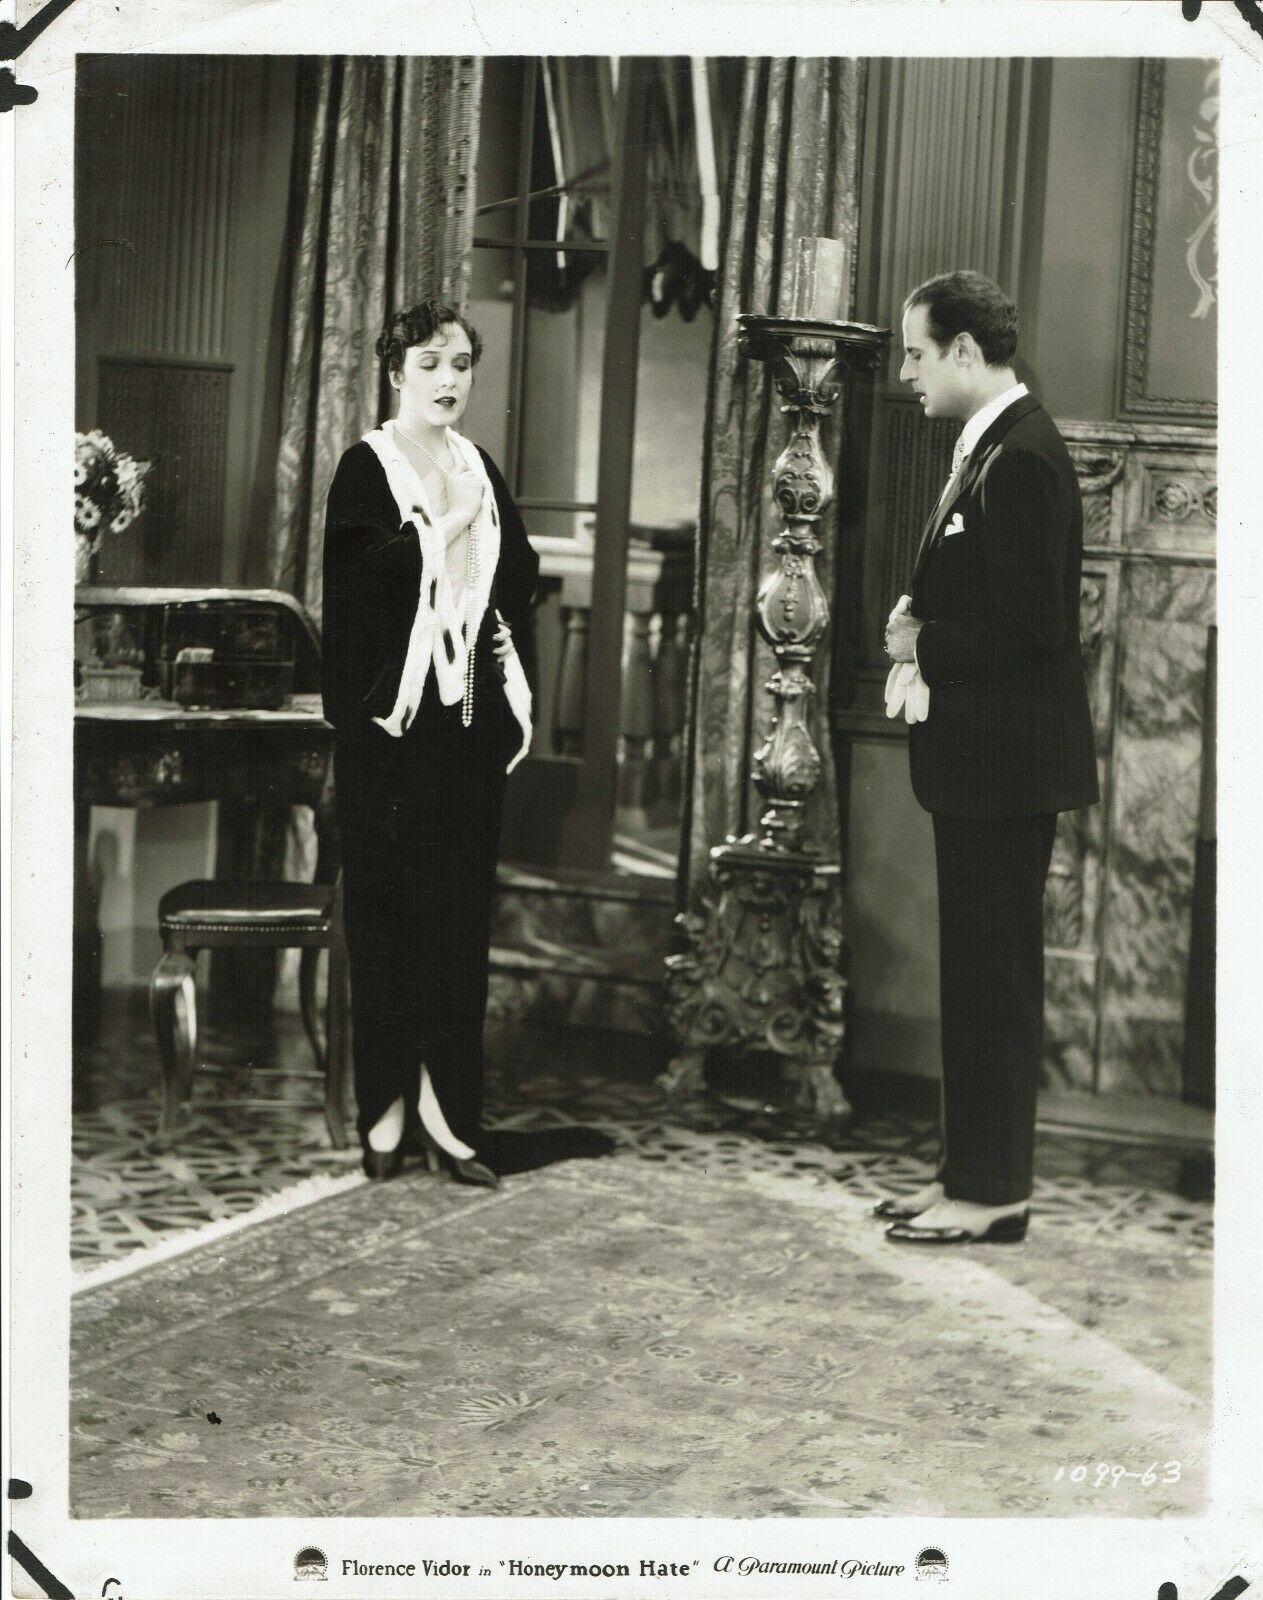 Tullio Carminati and Florence Vidor in Honeymoon Hate (1927)